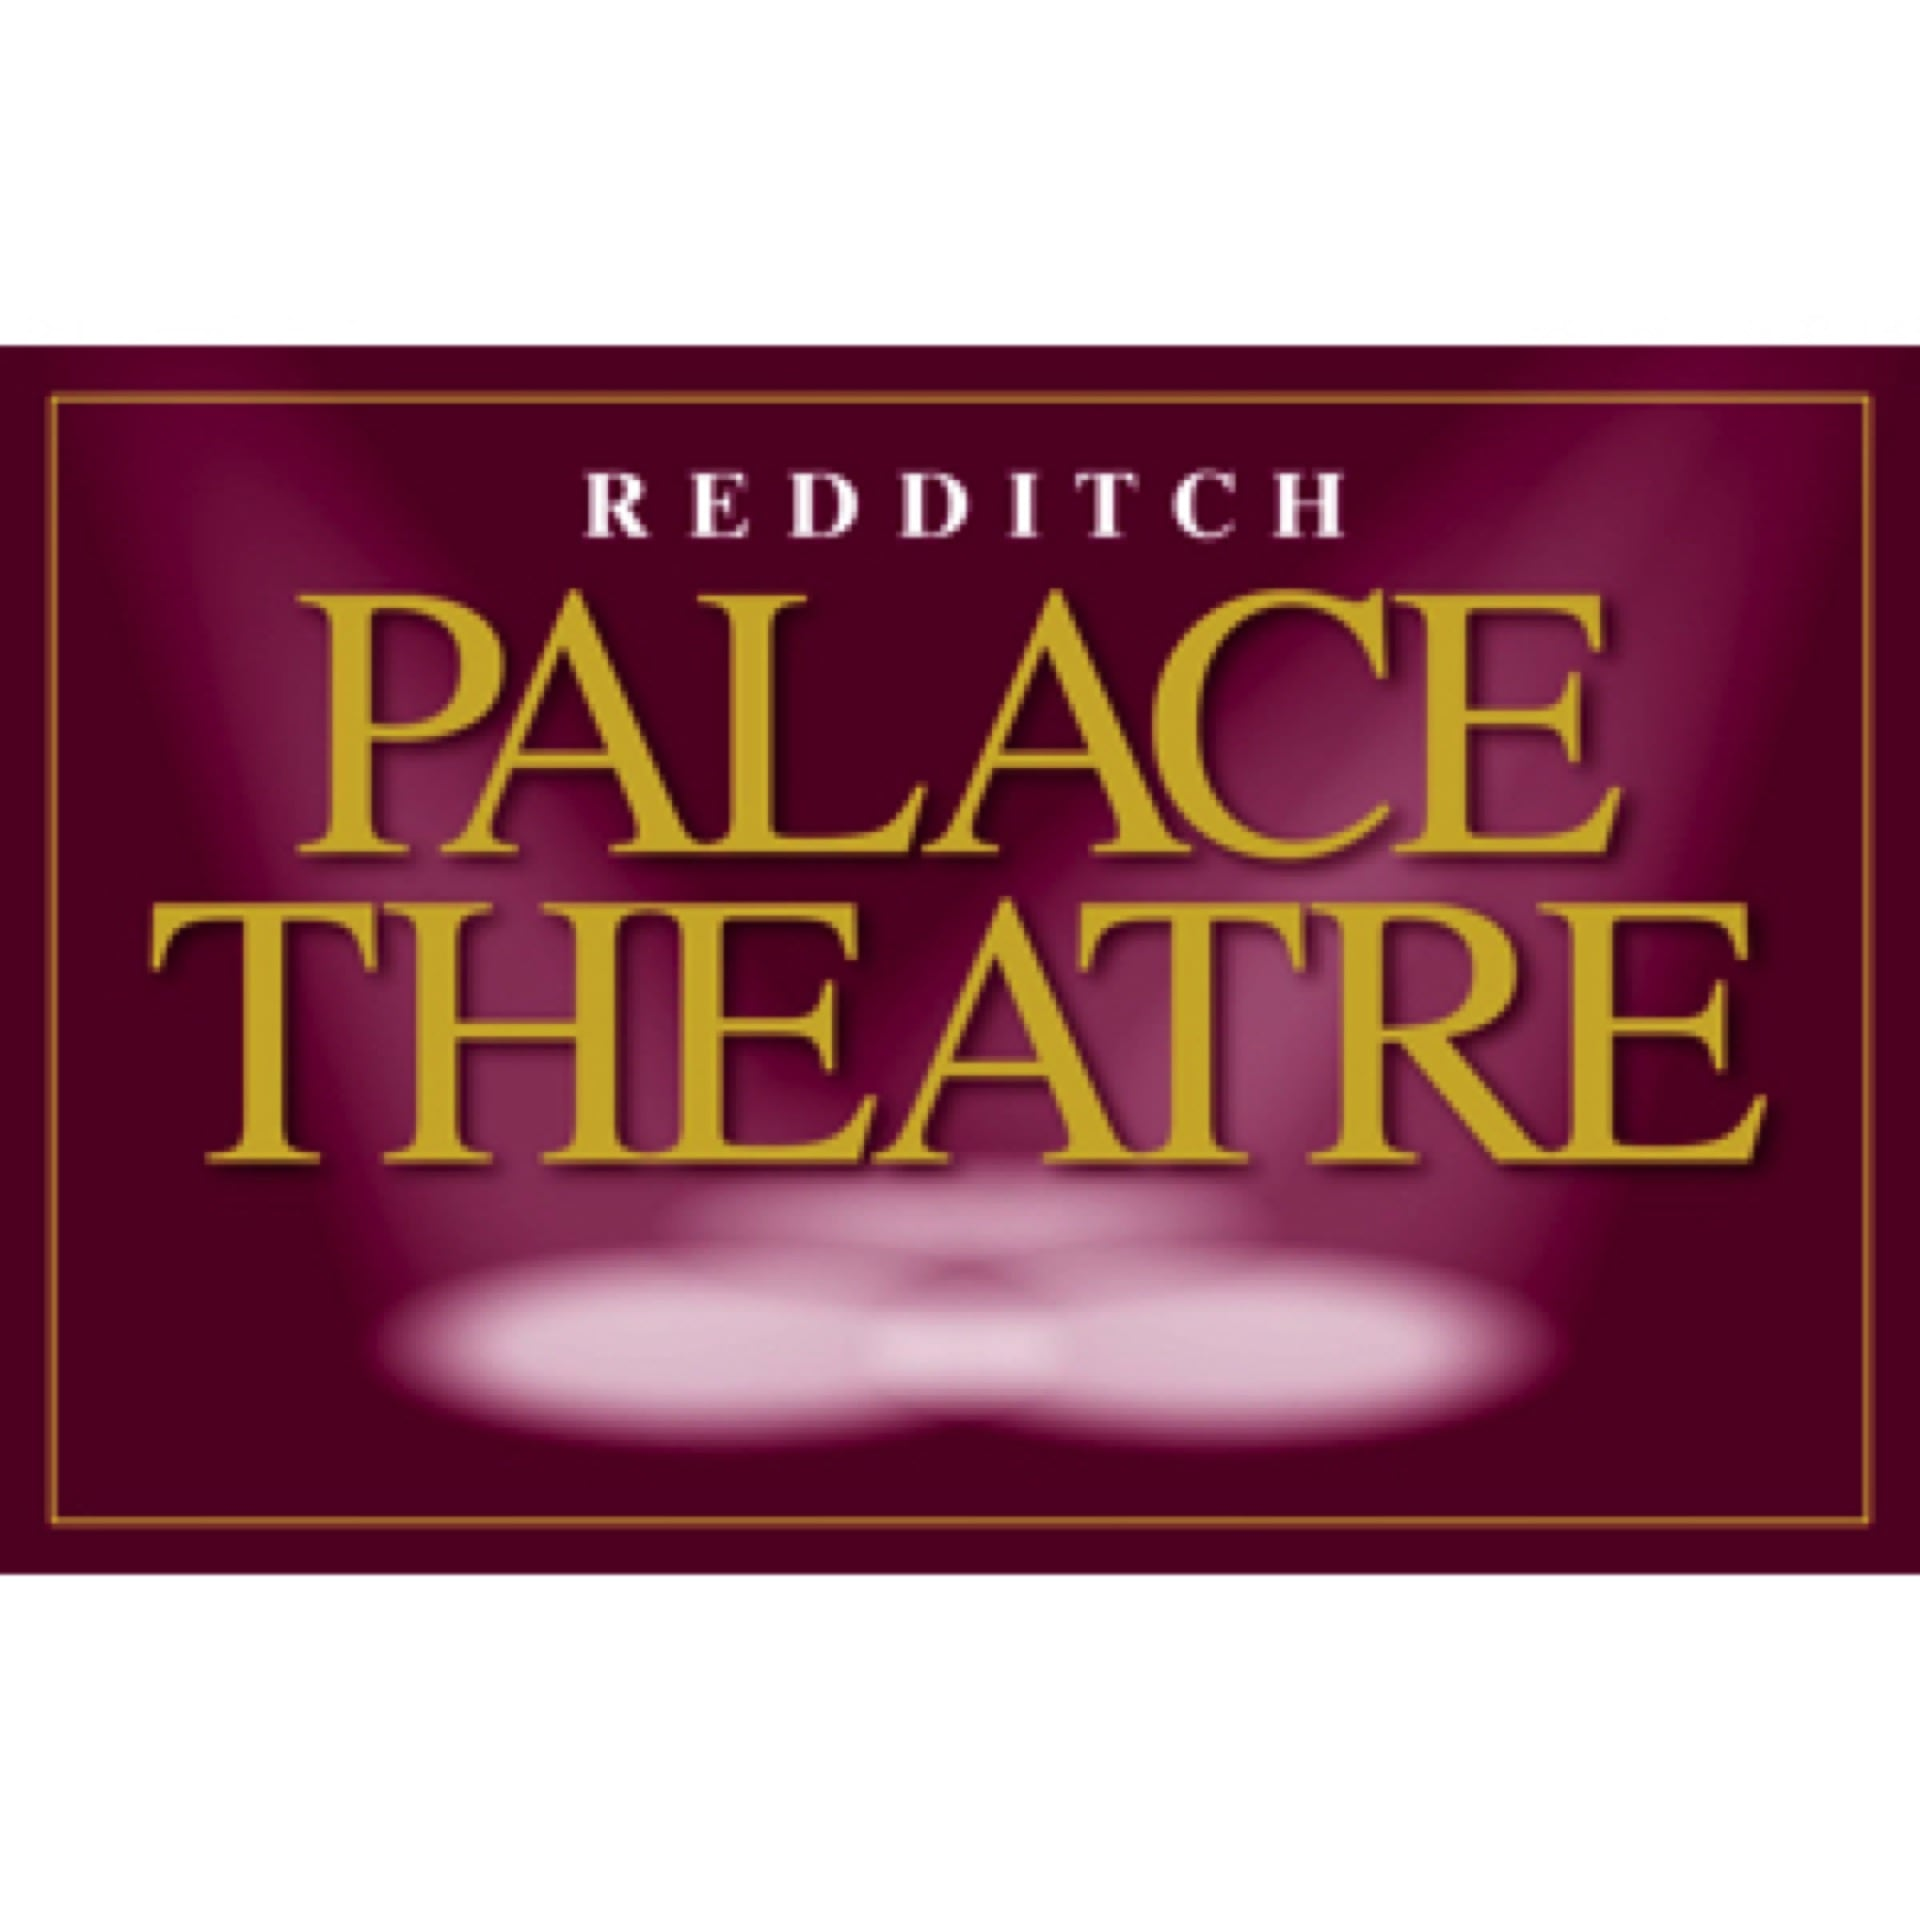 Redditch Palace Theatre